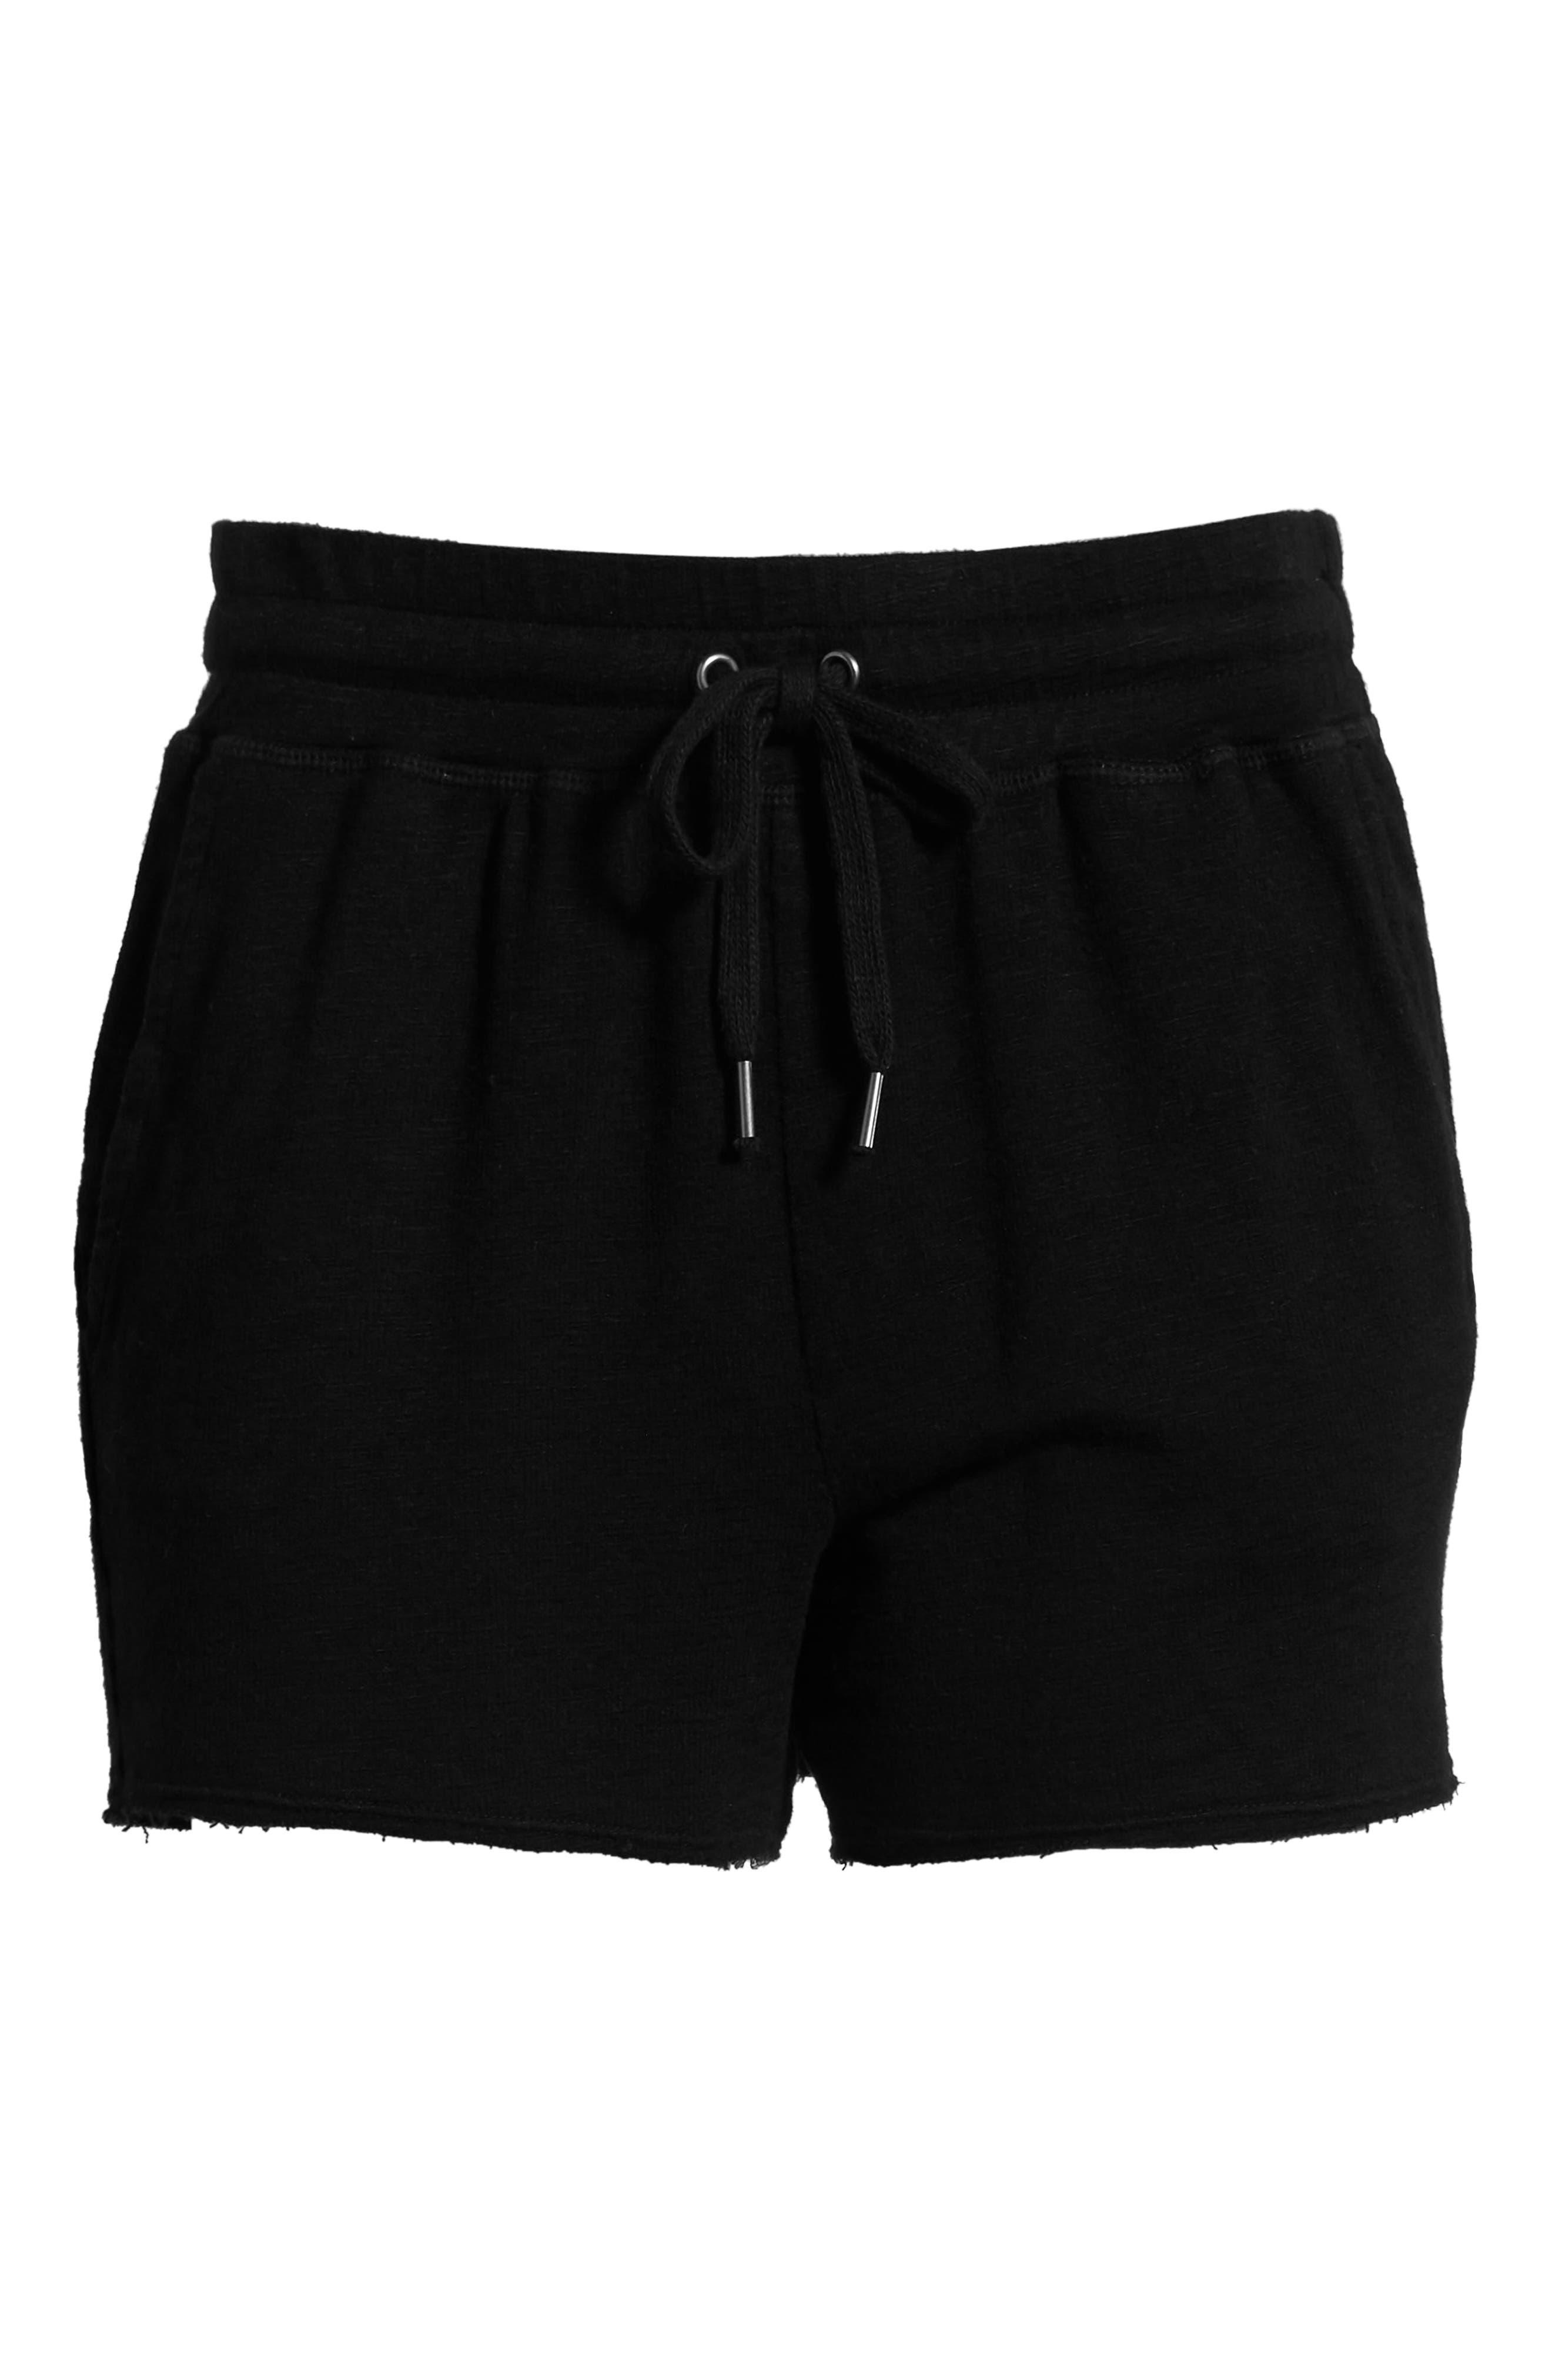 Active Shorts,                             Alternate thumbnail 6, color,                             BLACK